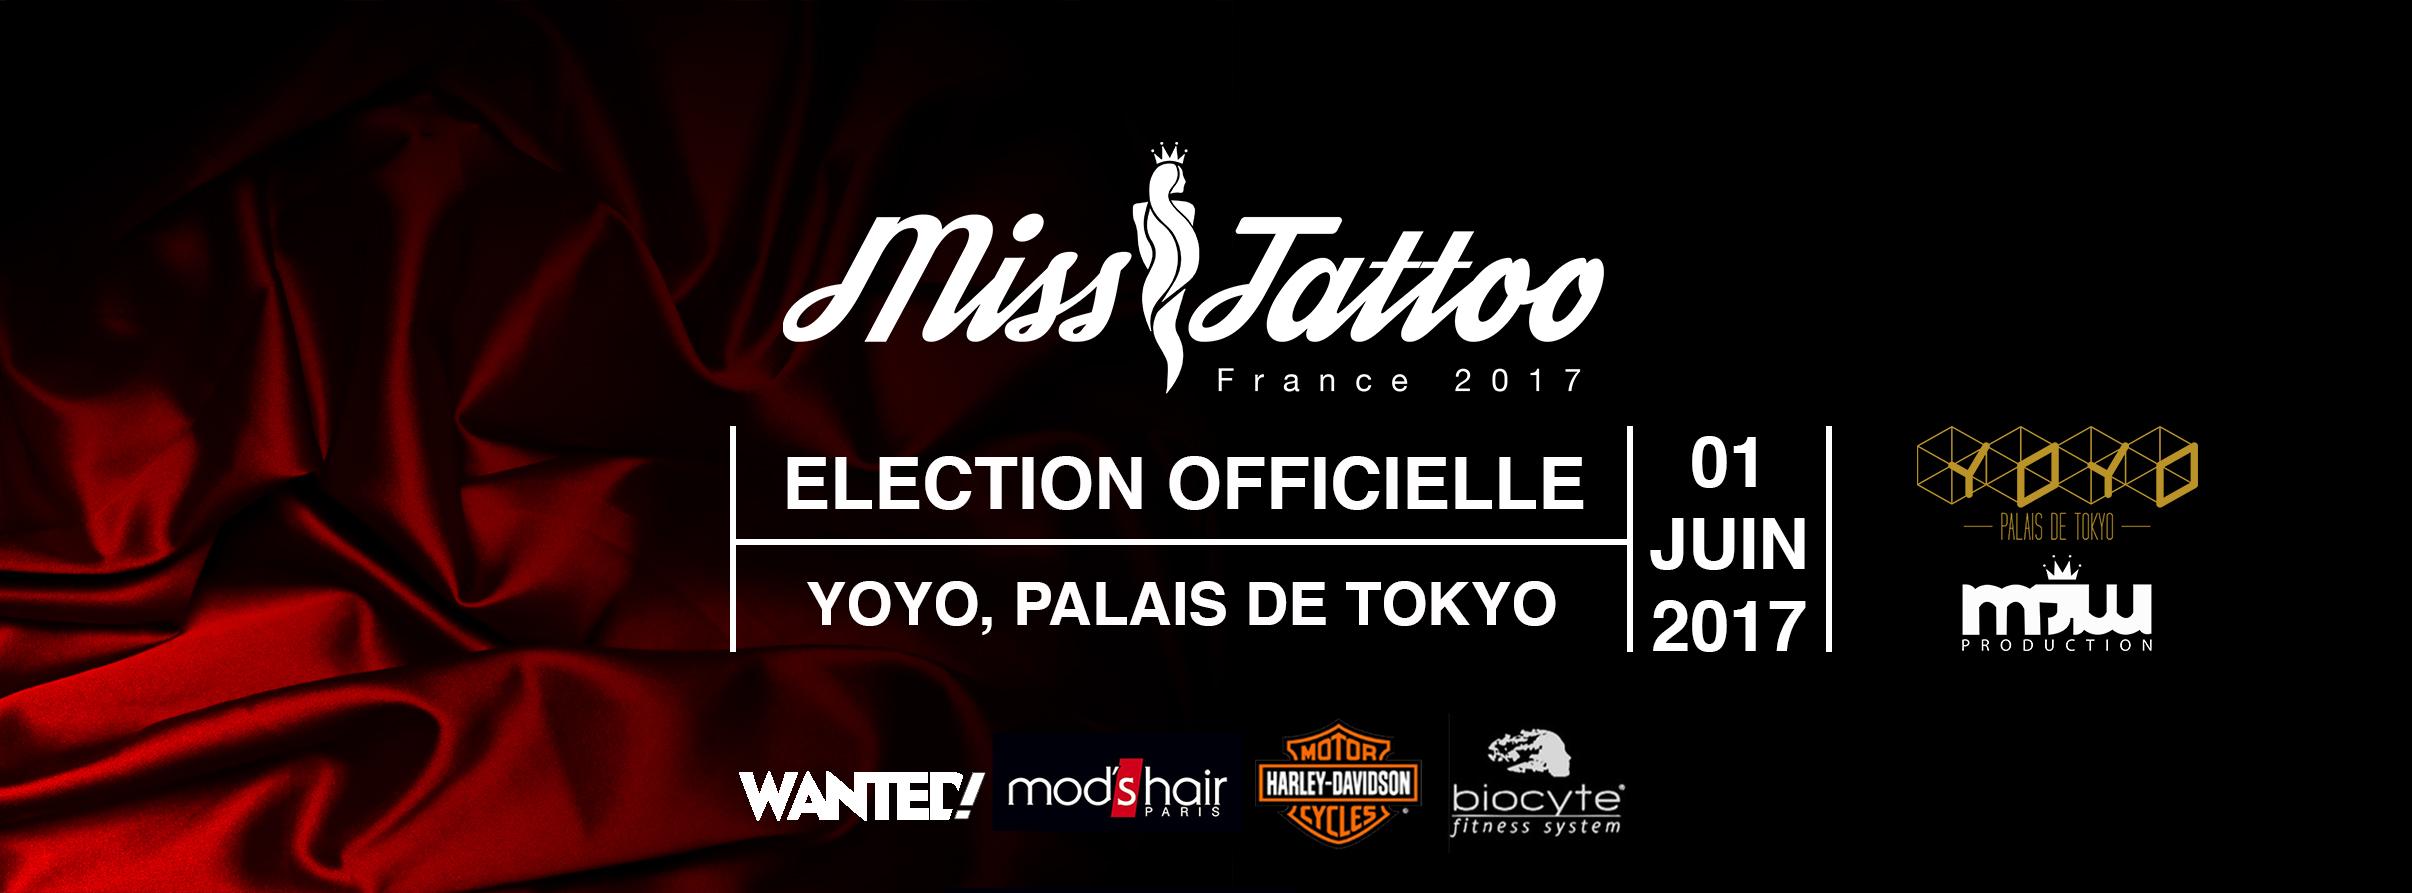 Miss tattoo France 2017 : fin des inscriptions le 15 mars